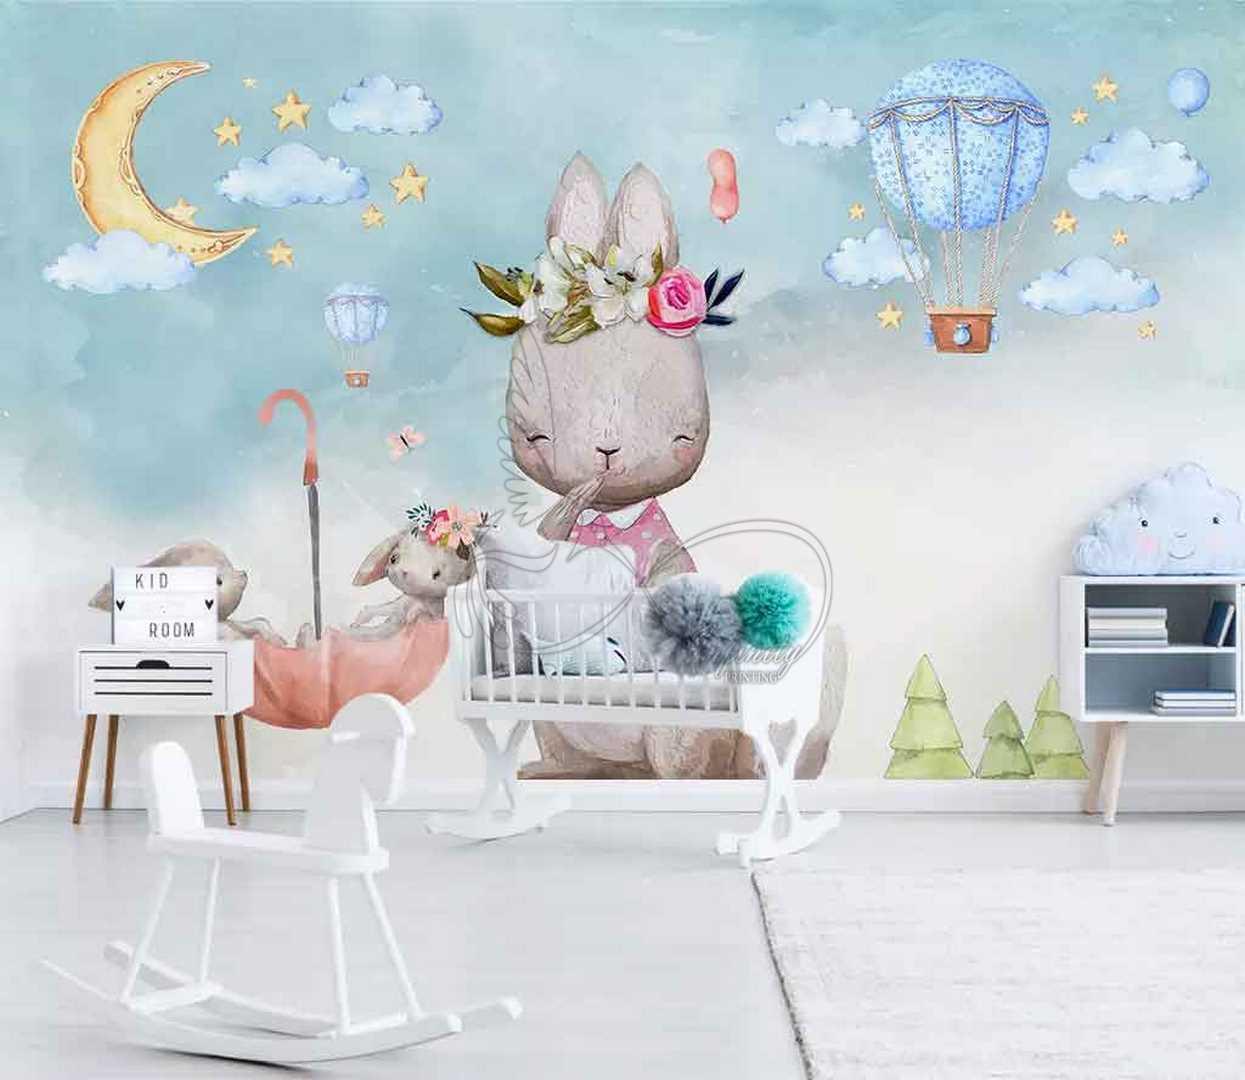 Fantasy child room design wall poster printing code 3140